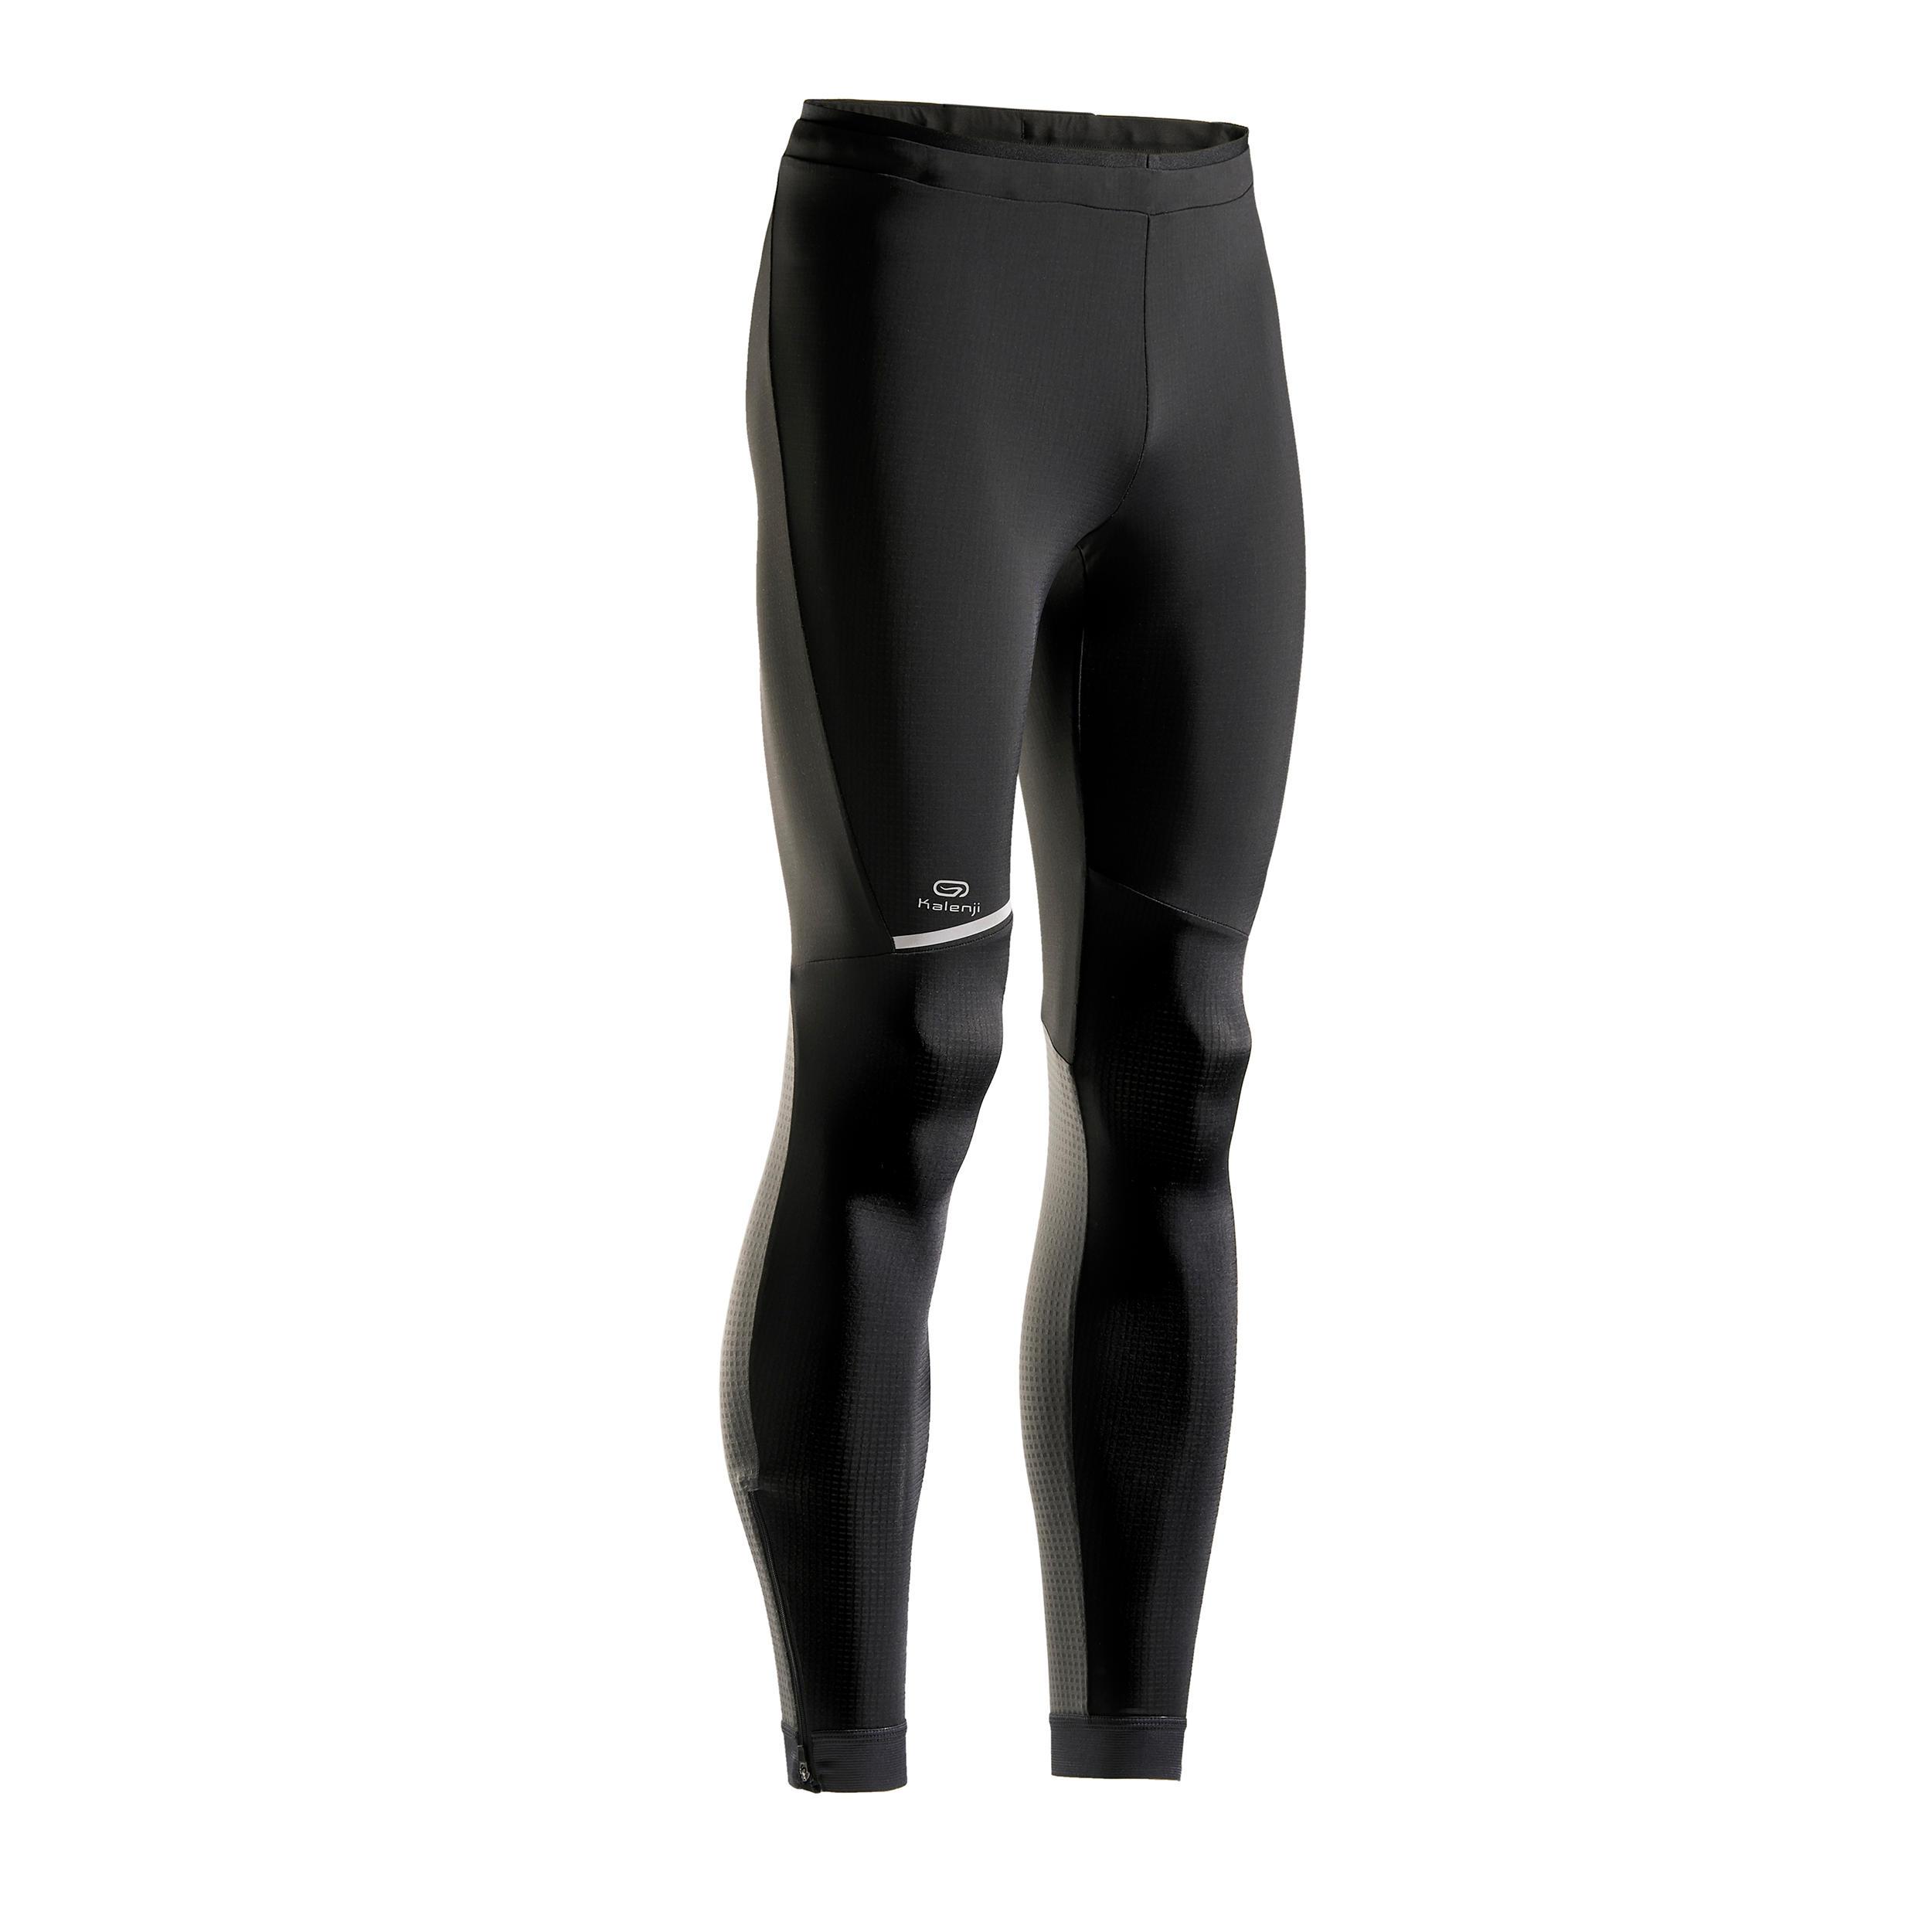 Laufhose lang Tights Kiprun Warm Herren | Sportbekleidung > Sporthosen > Laufhosen | Kiprun